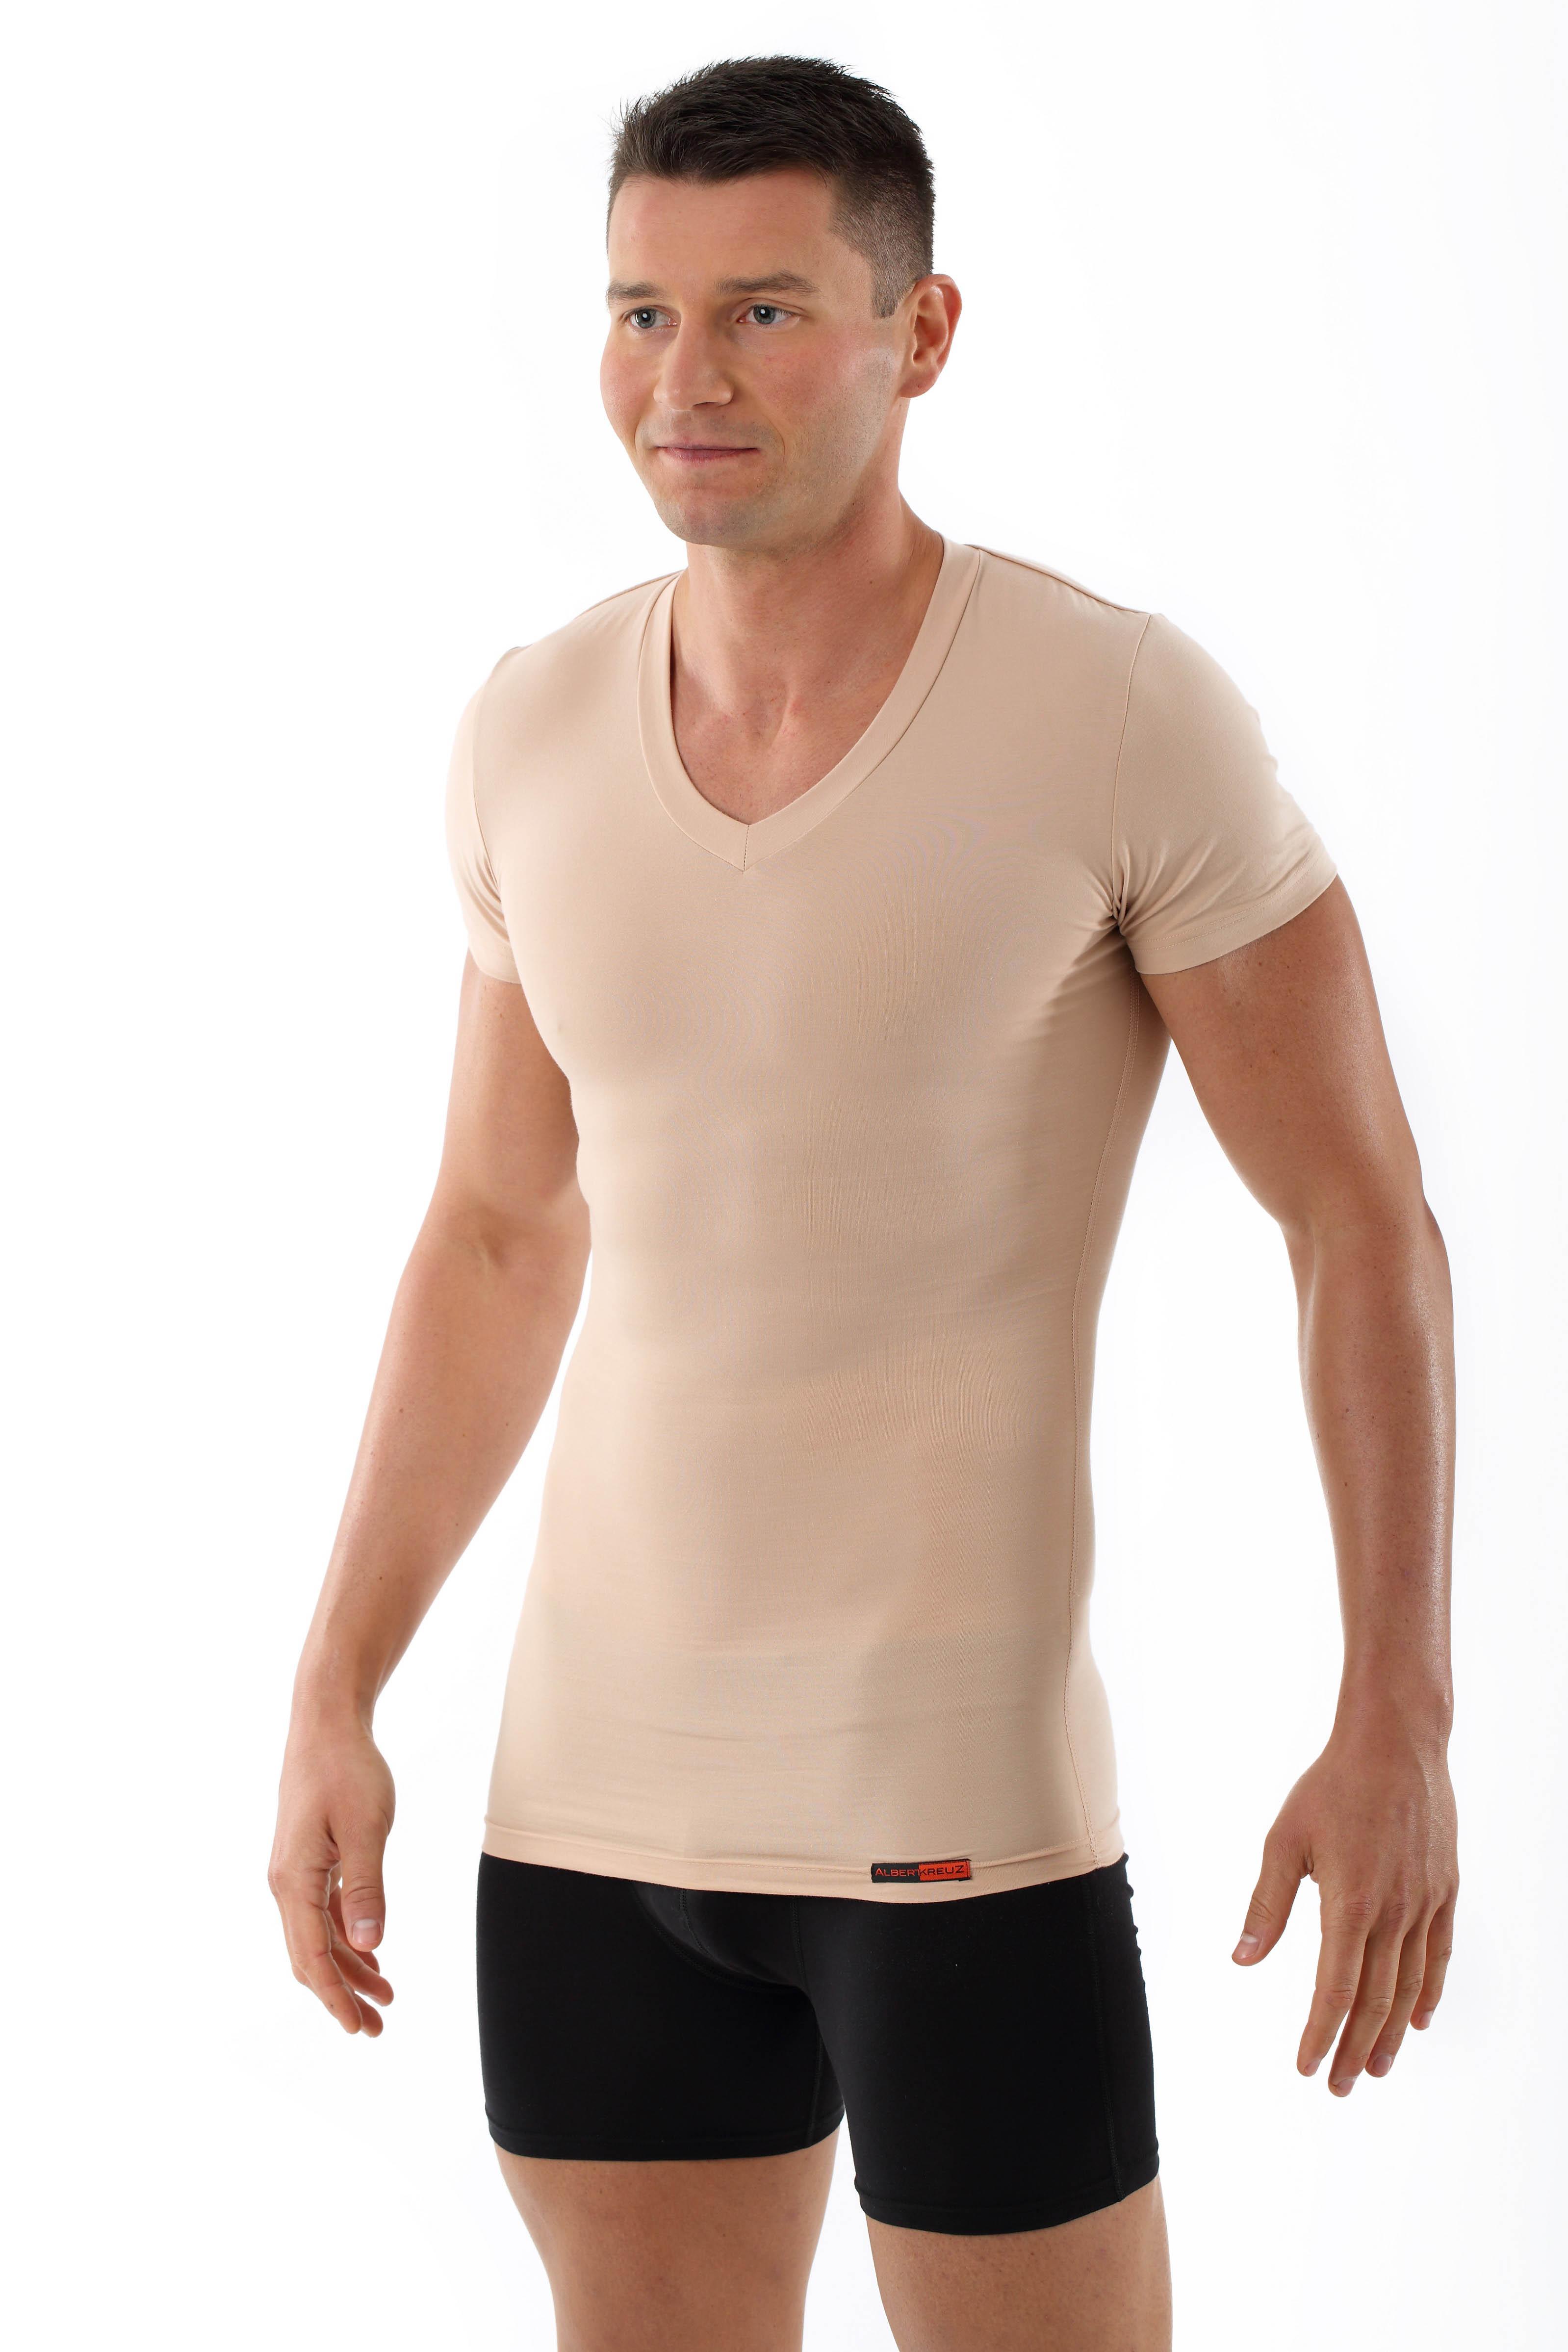 Invisible compression shirt